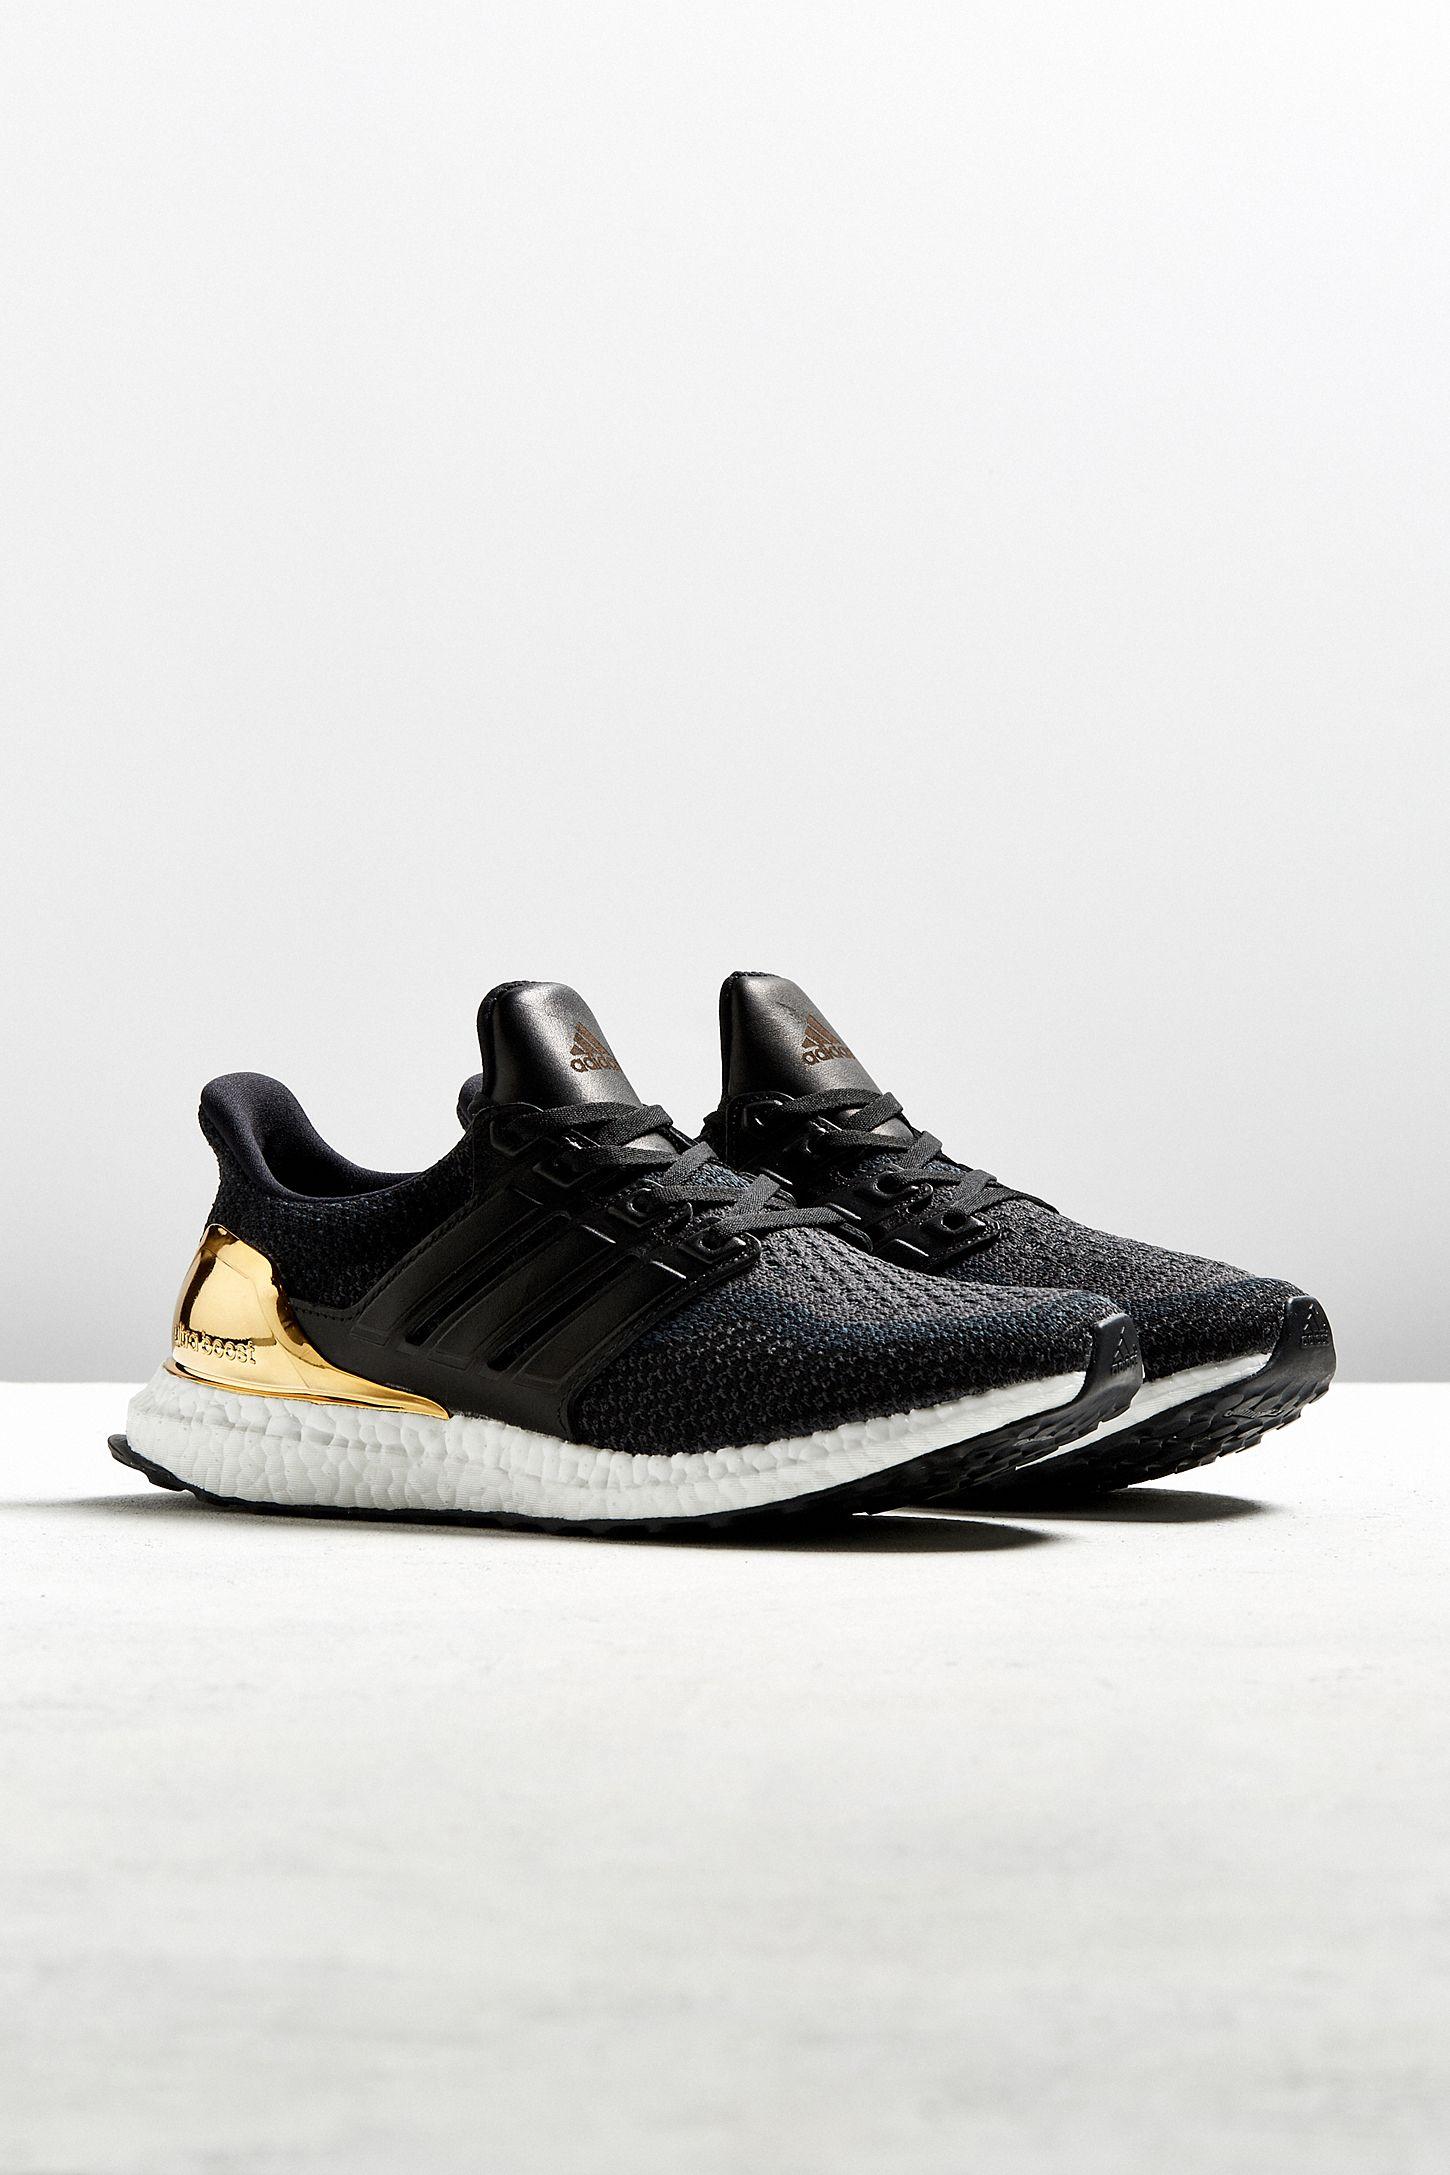 41c991bda1ca adidas Ultra Boost Olympic Gold Medal Pack Sneaker